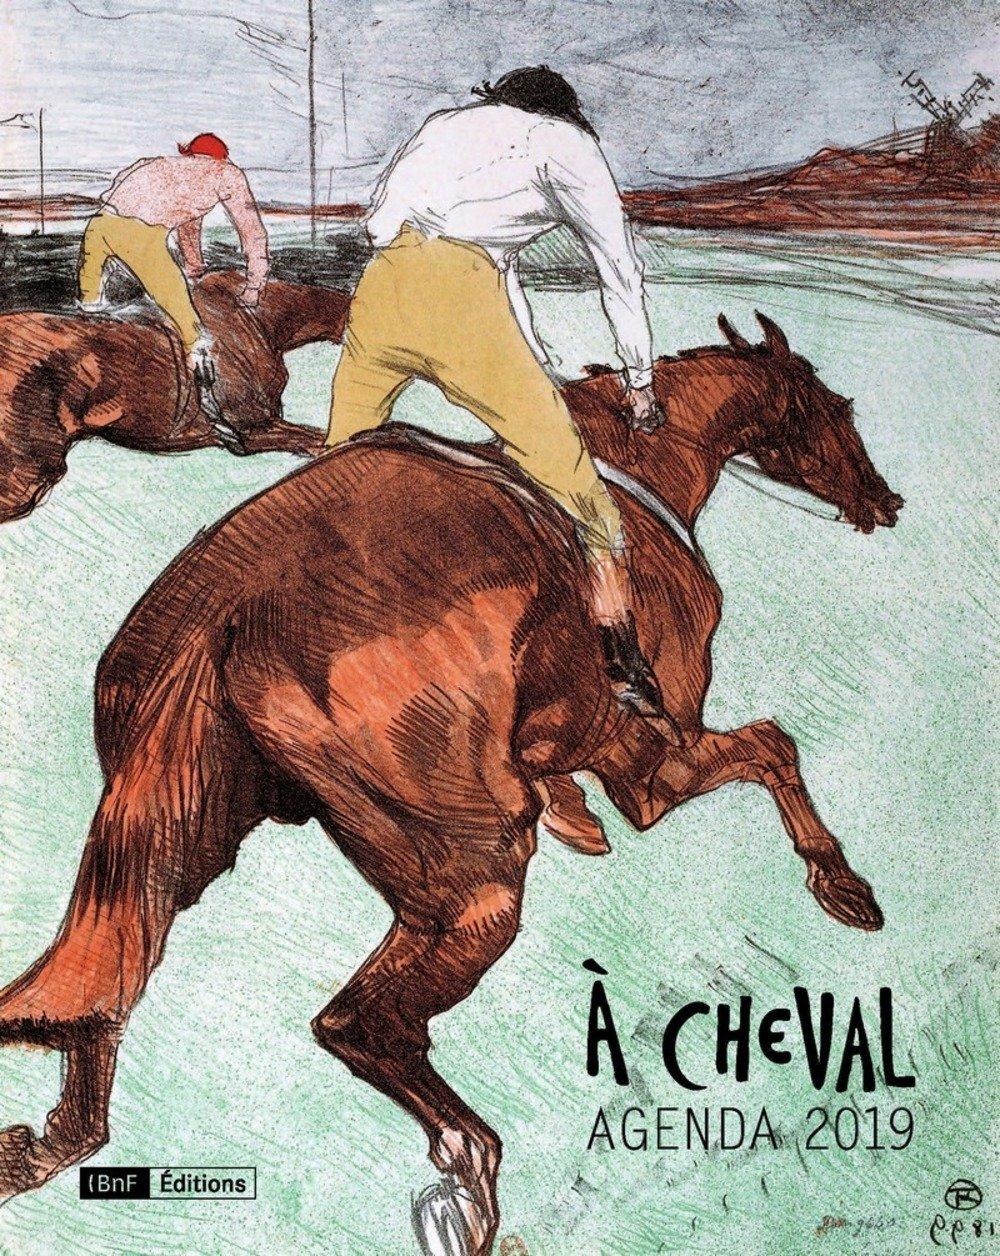 Agenda 2019 - A cheval Broché – 5 juin 2018 Collectif BnF éditions 2717727876 Arts décoratifs traditions